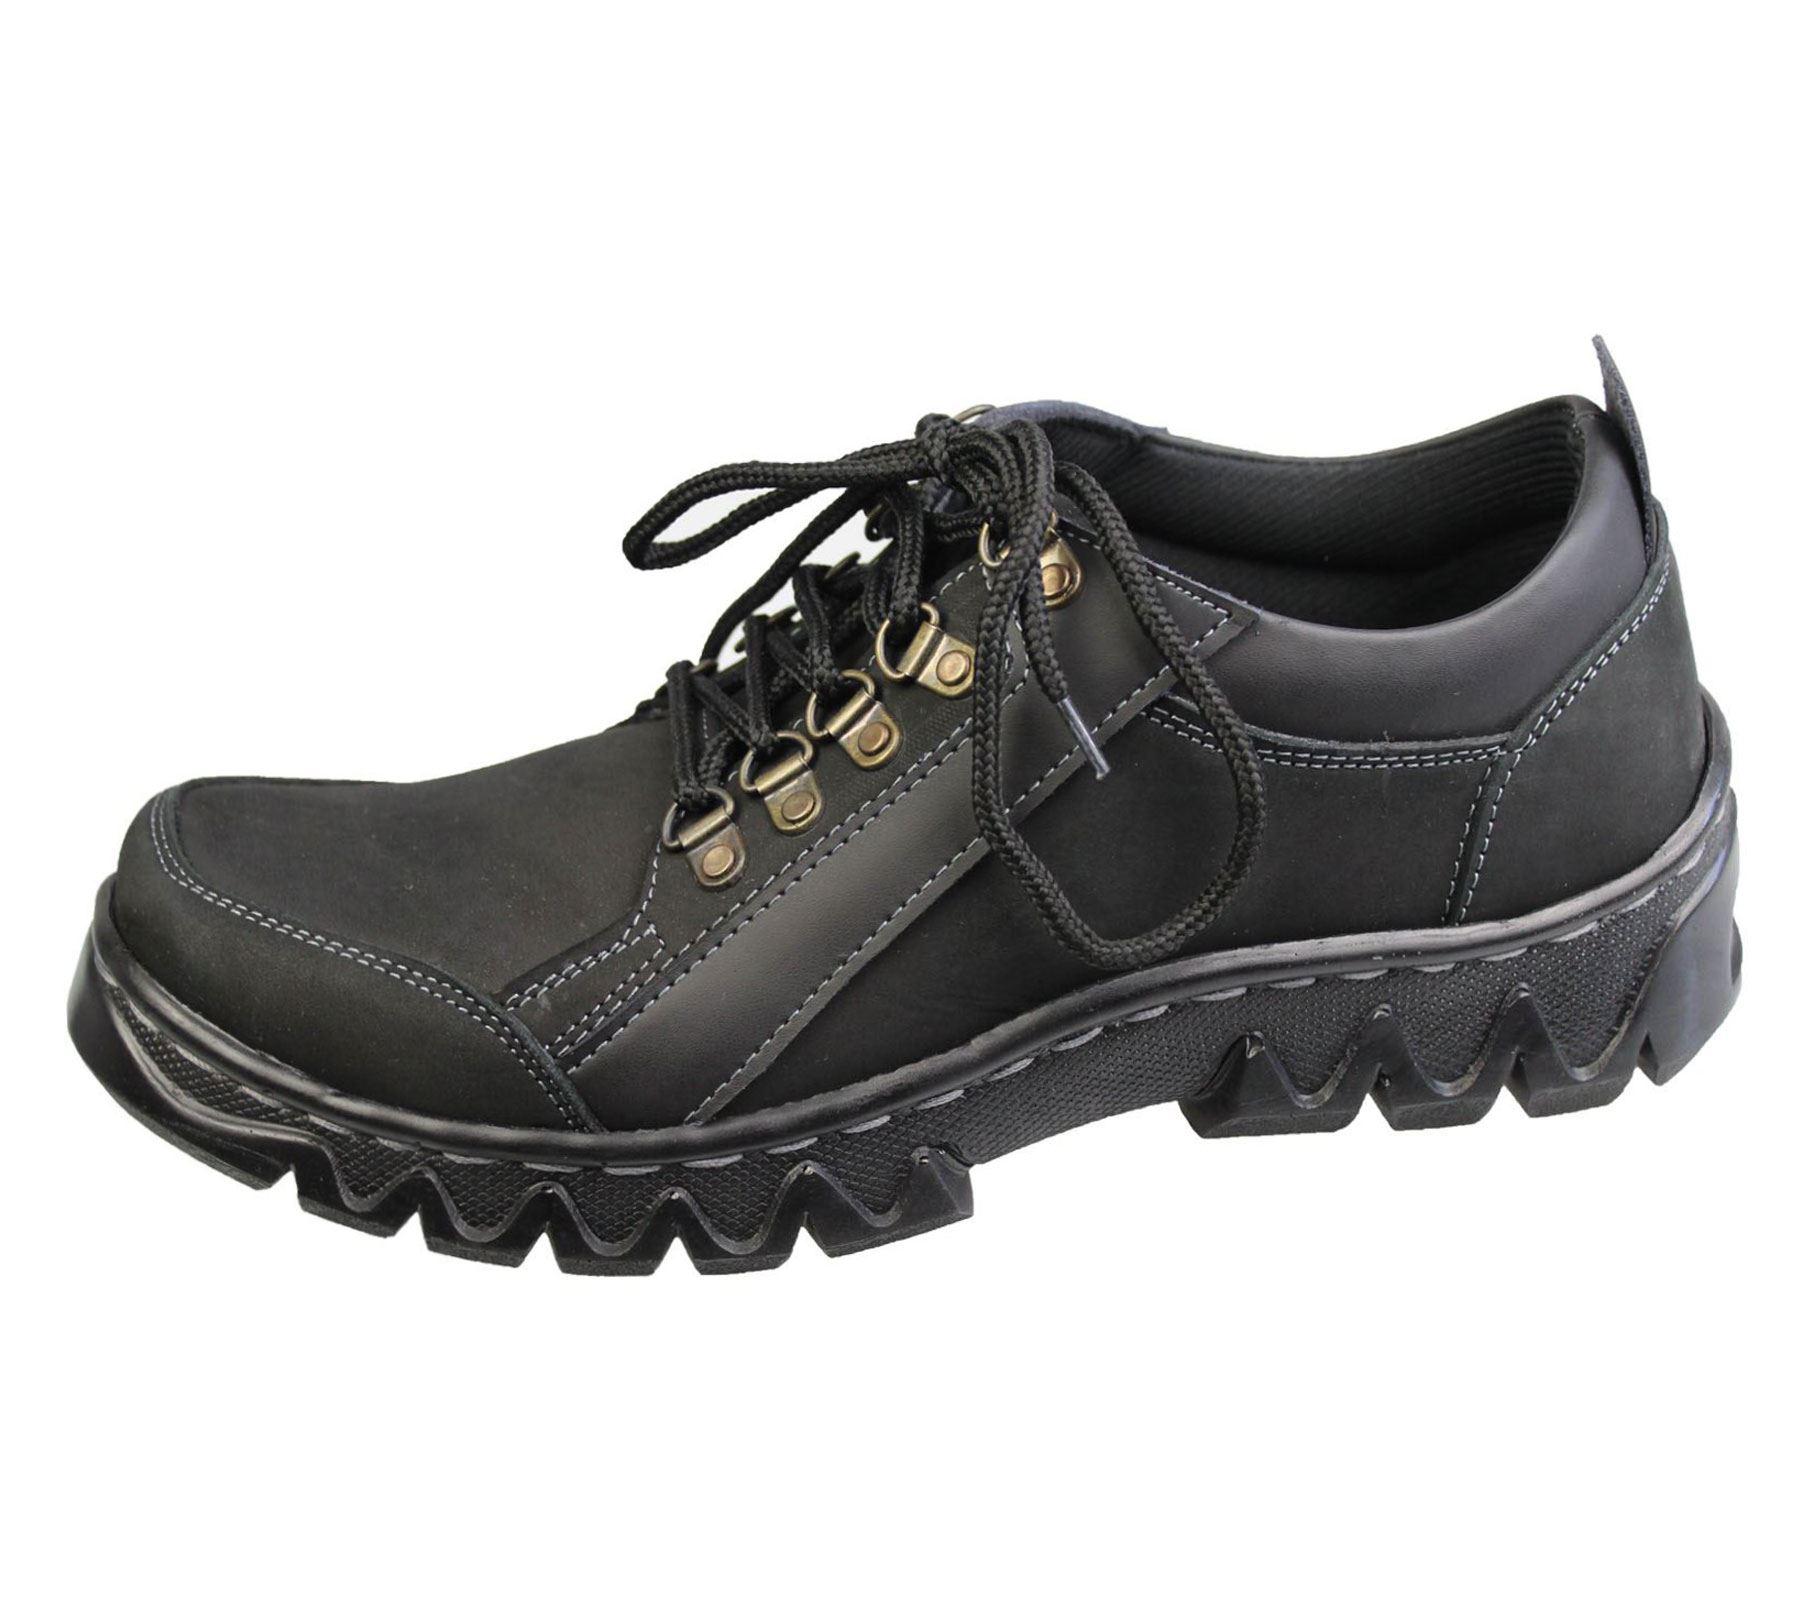 Ebay Australia Shoe Size Chart